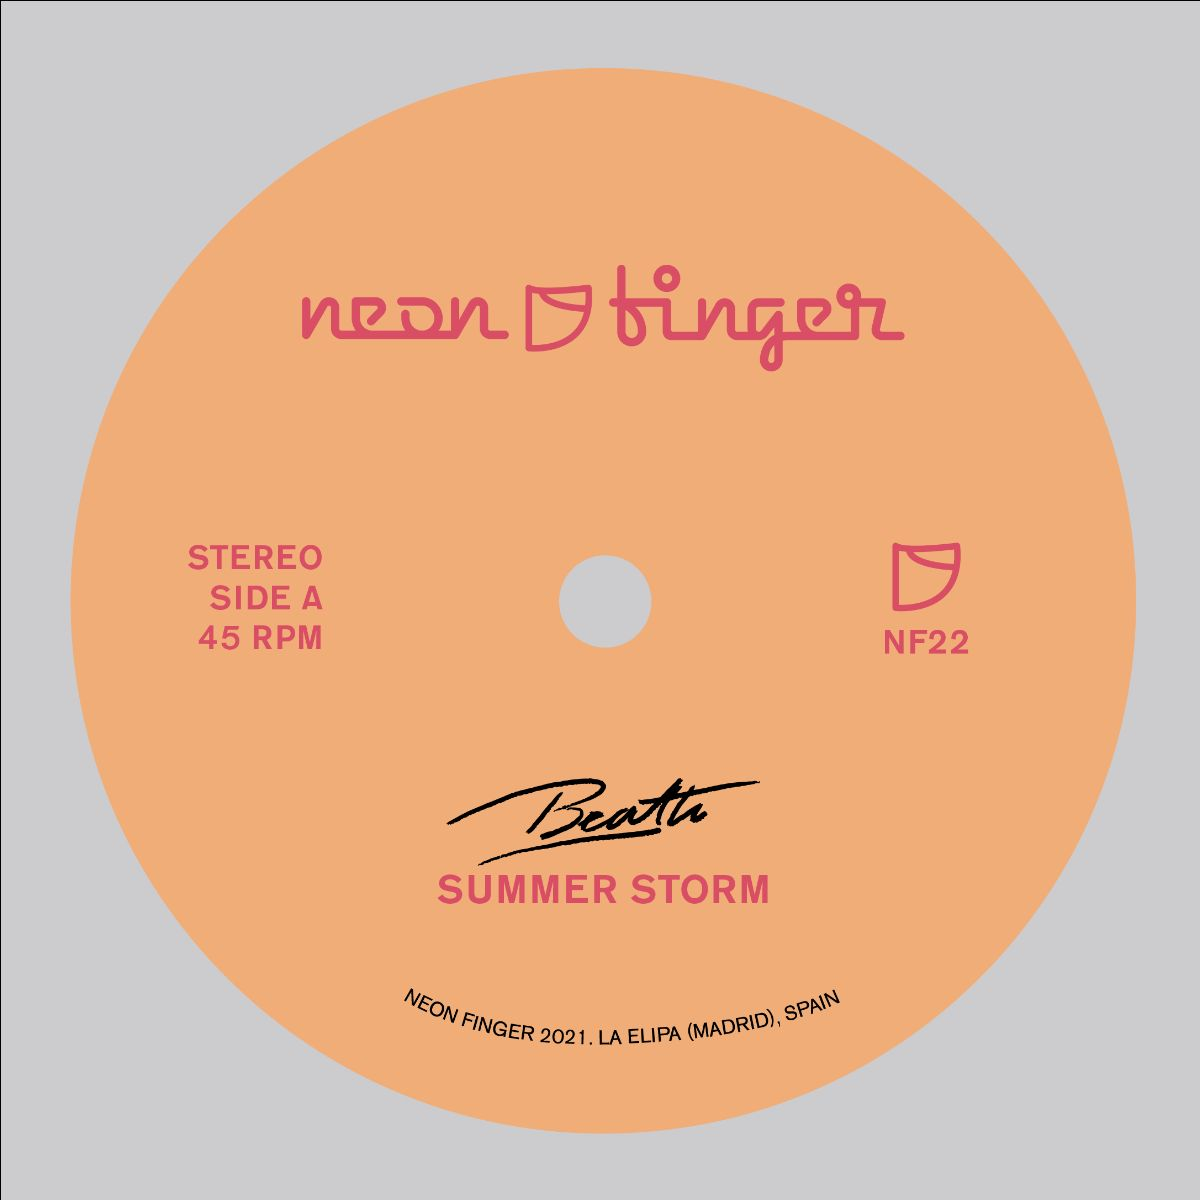 Beath - Summer Storm